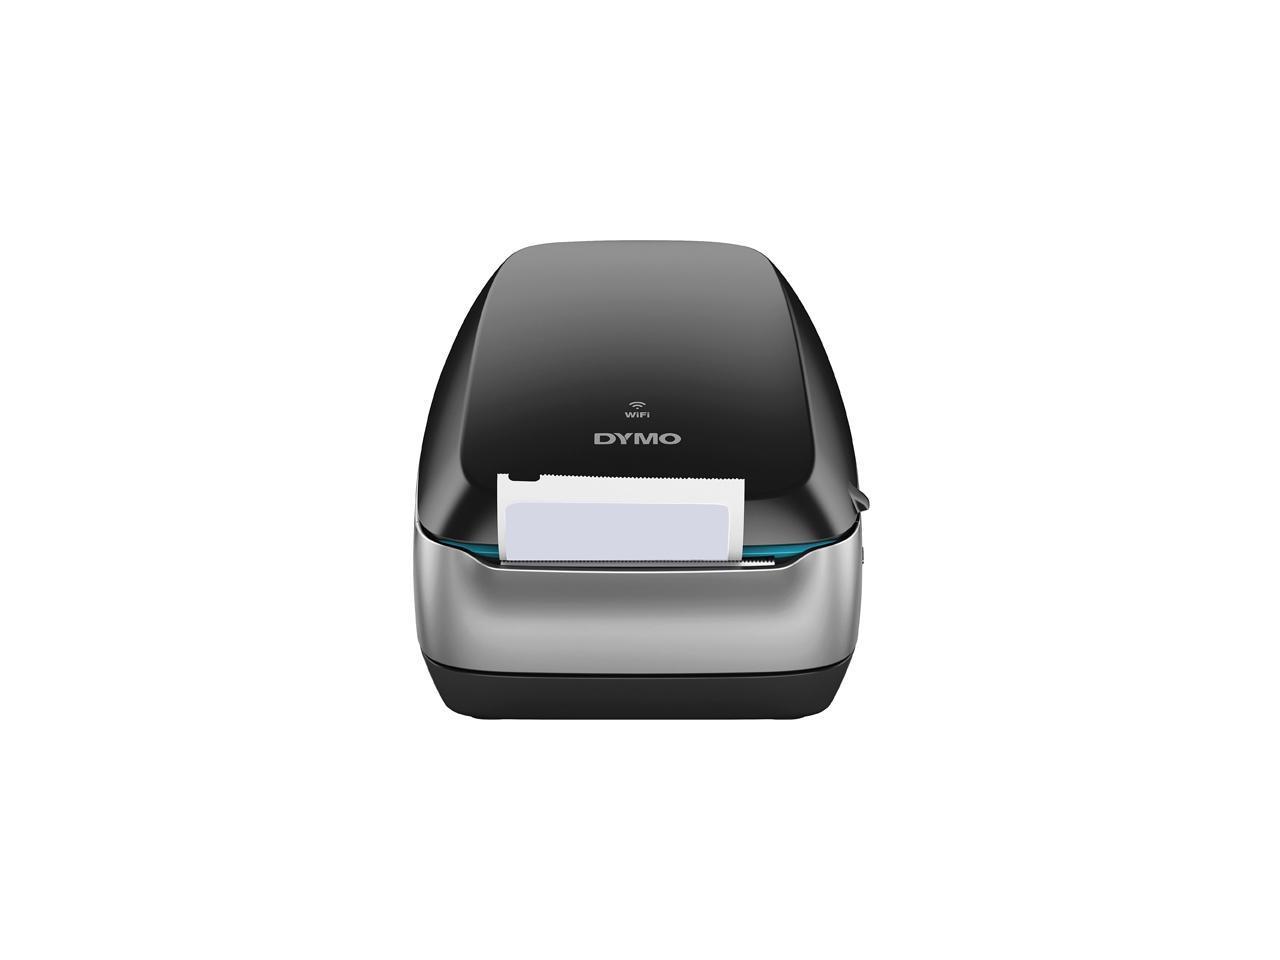 Return Item 2002150 Dymo LabelWriter Wireless Label Printer Used